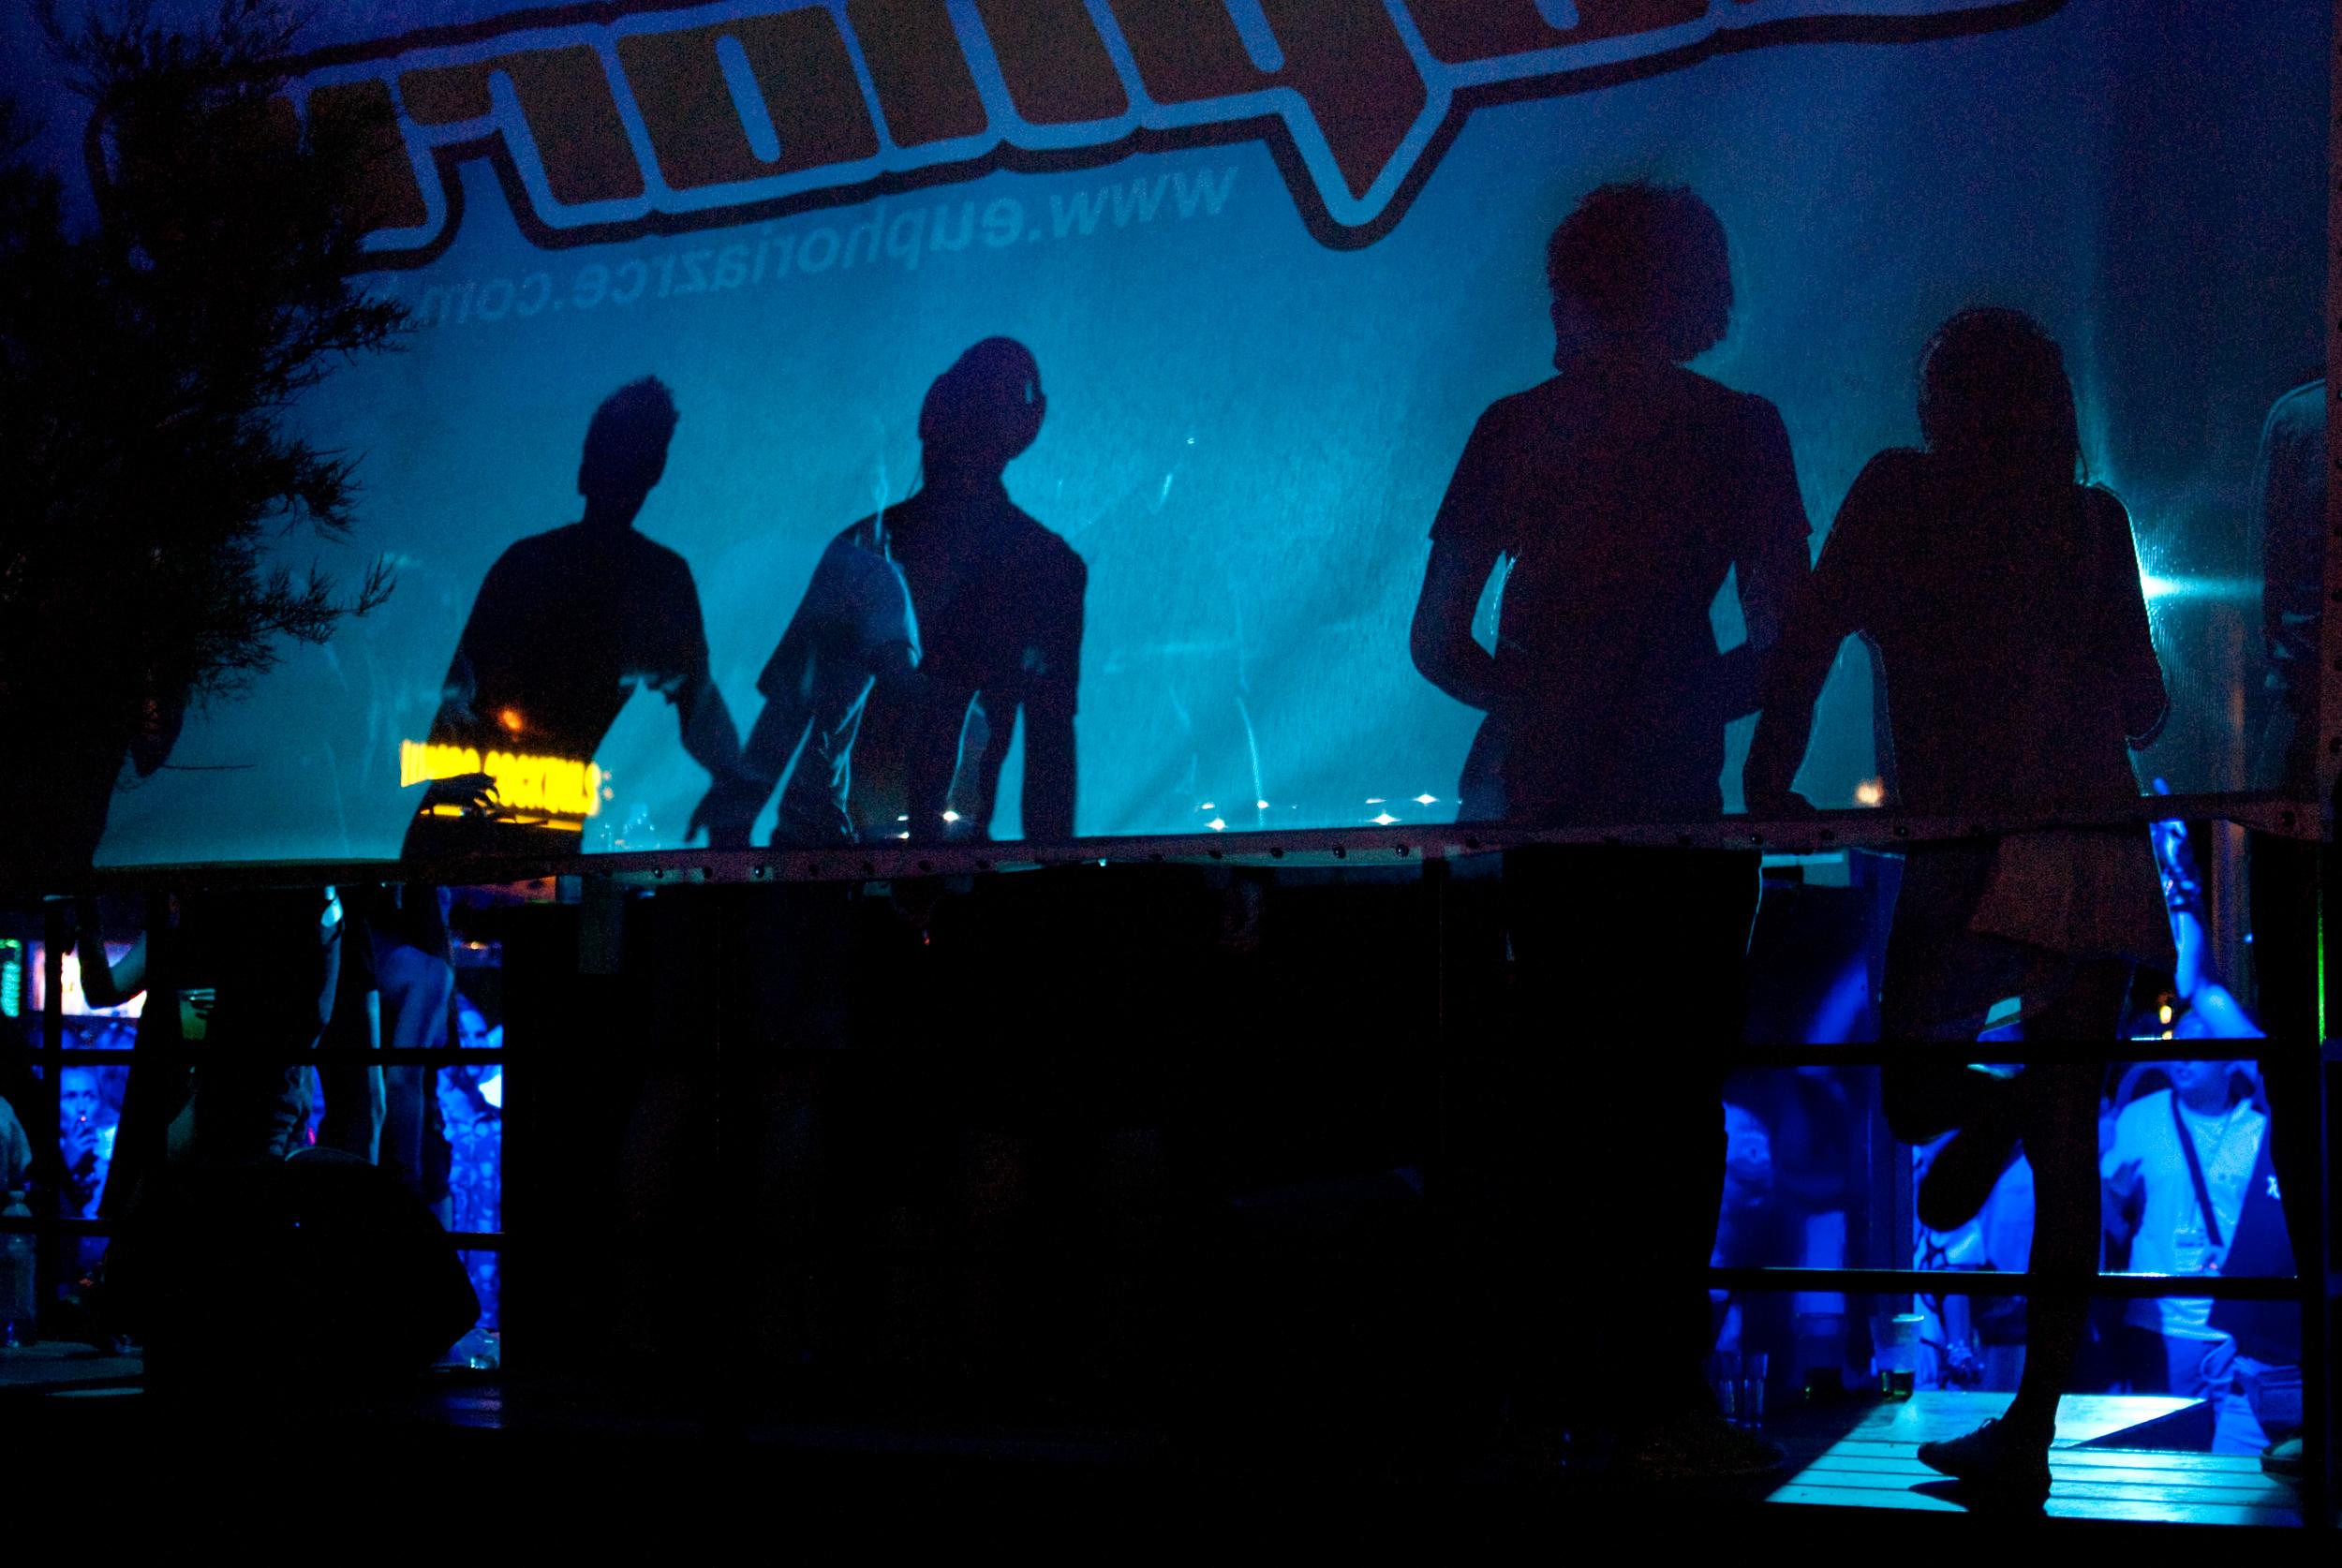 GeorginaCook_hideout_festival_croatia_road_artwork_shadows.jpg